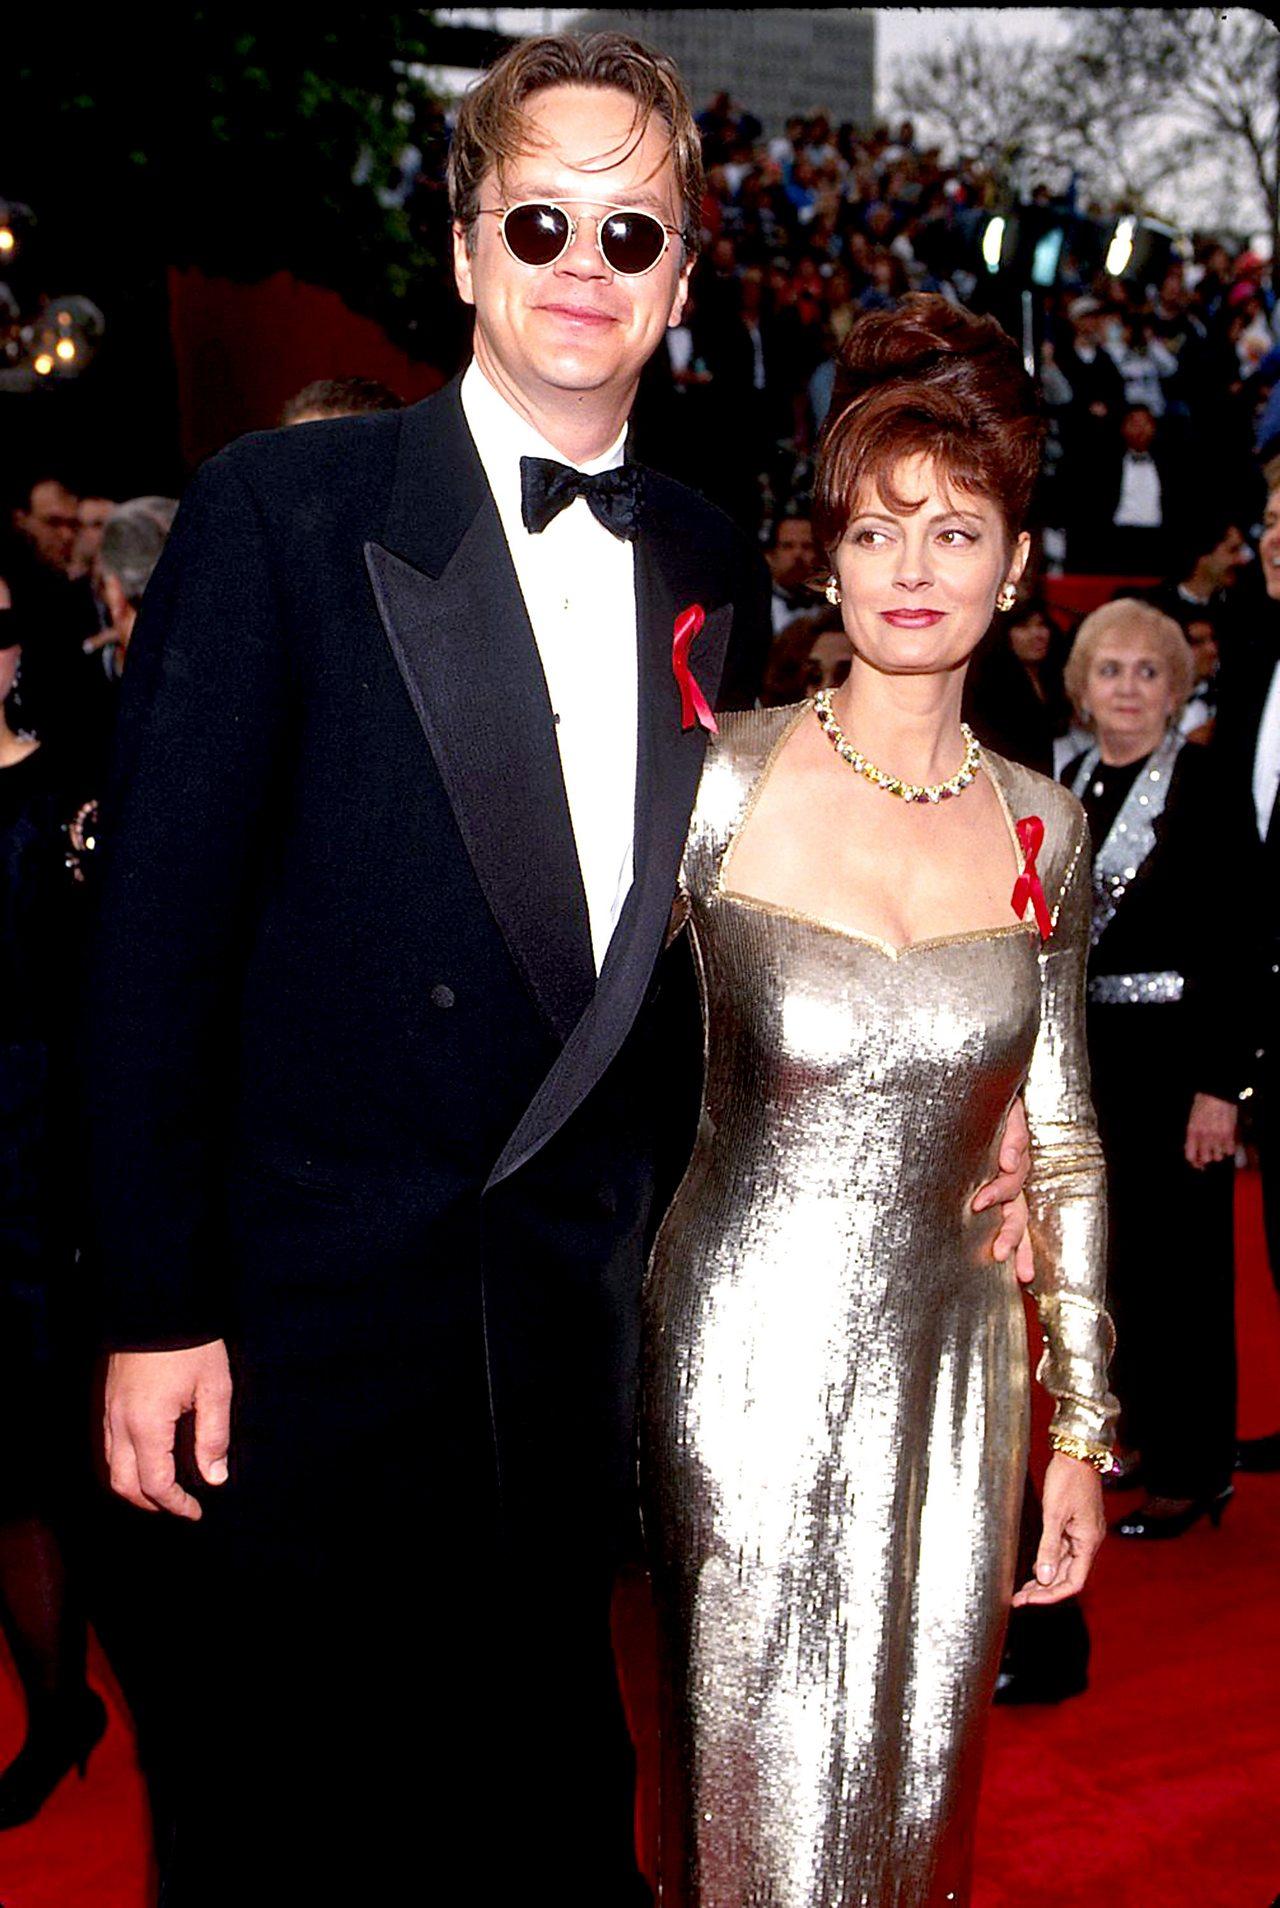 Susan Sarandon and Tim Robbins at the 1993 Oscars